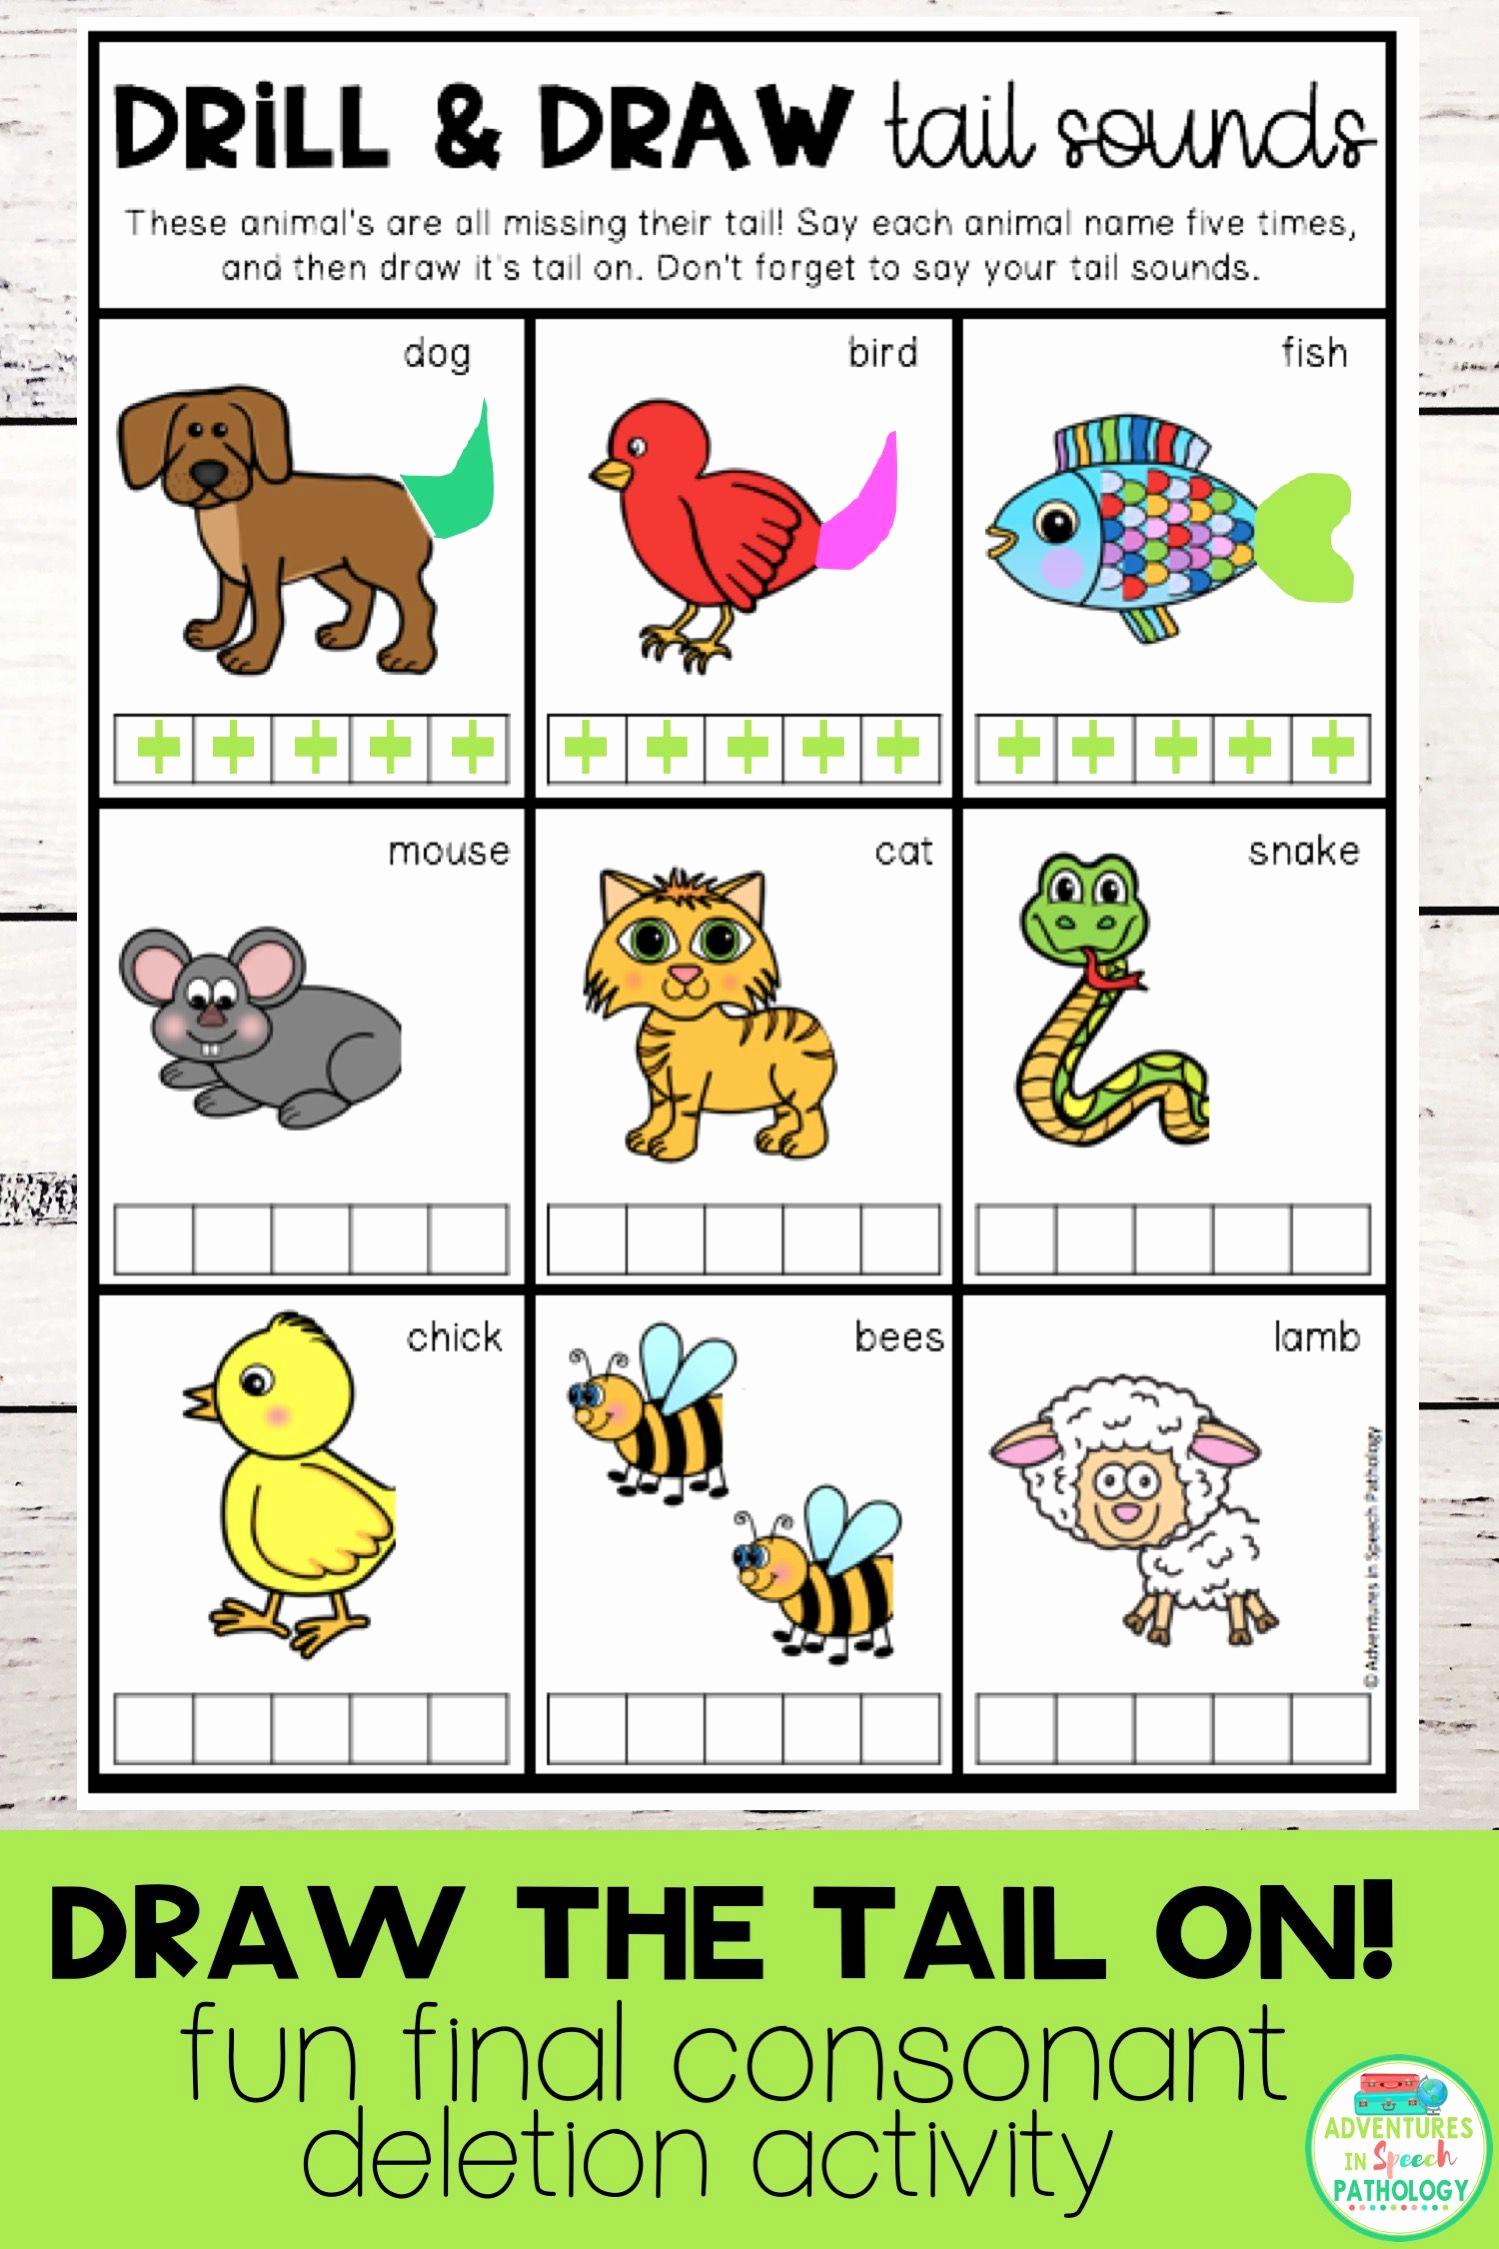 Final Consonant Deletion Worksheet Inspirational 30 Final Consonant Deletion Worksheet